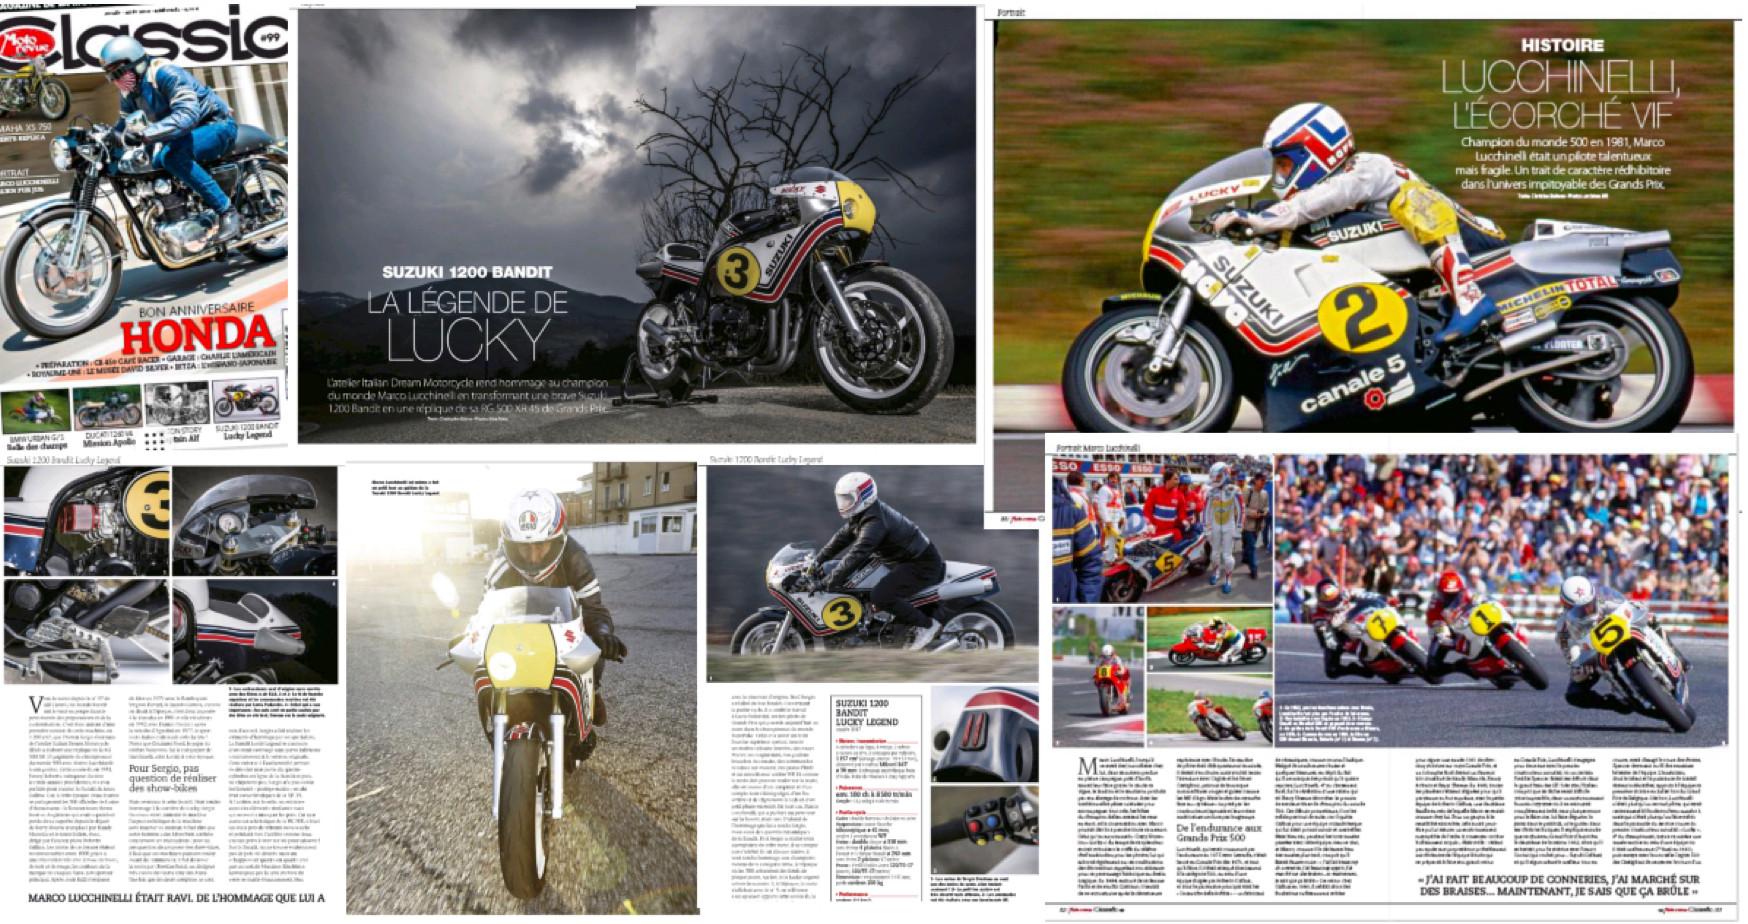 moto revue classic.jpg